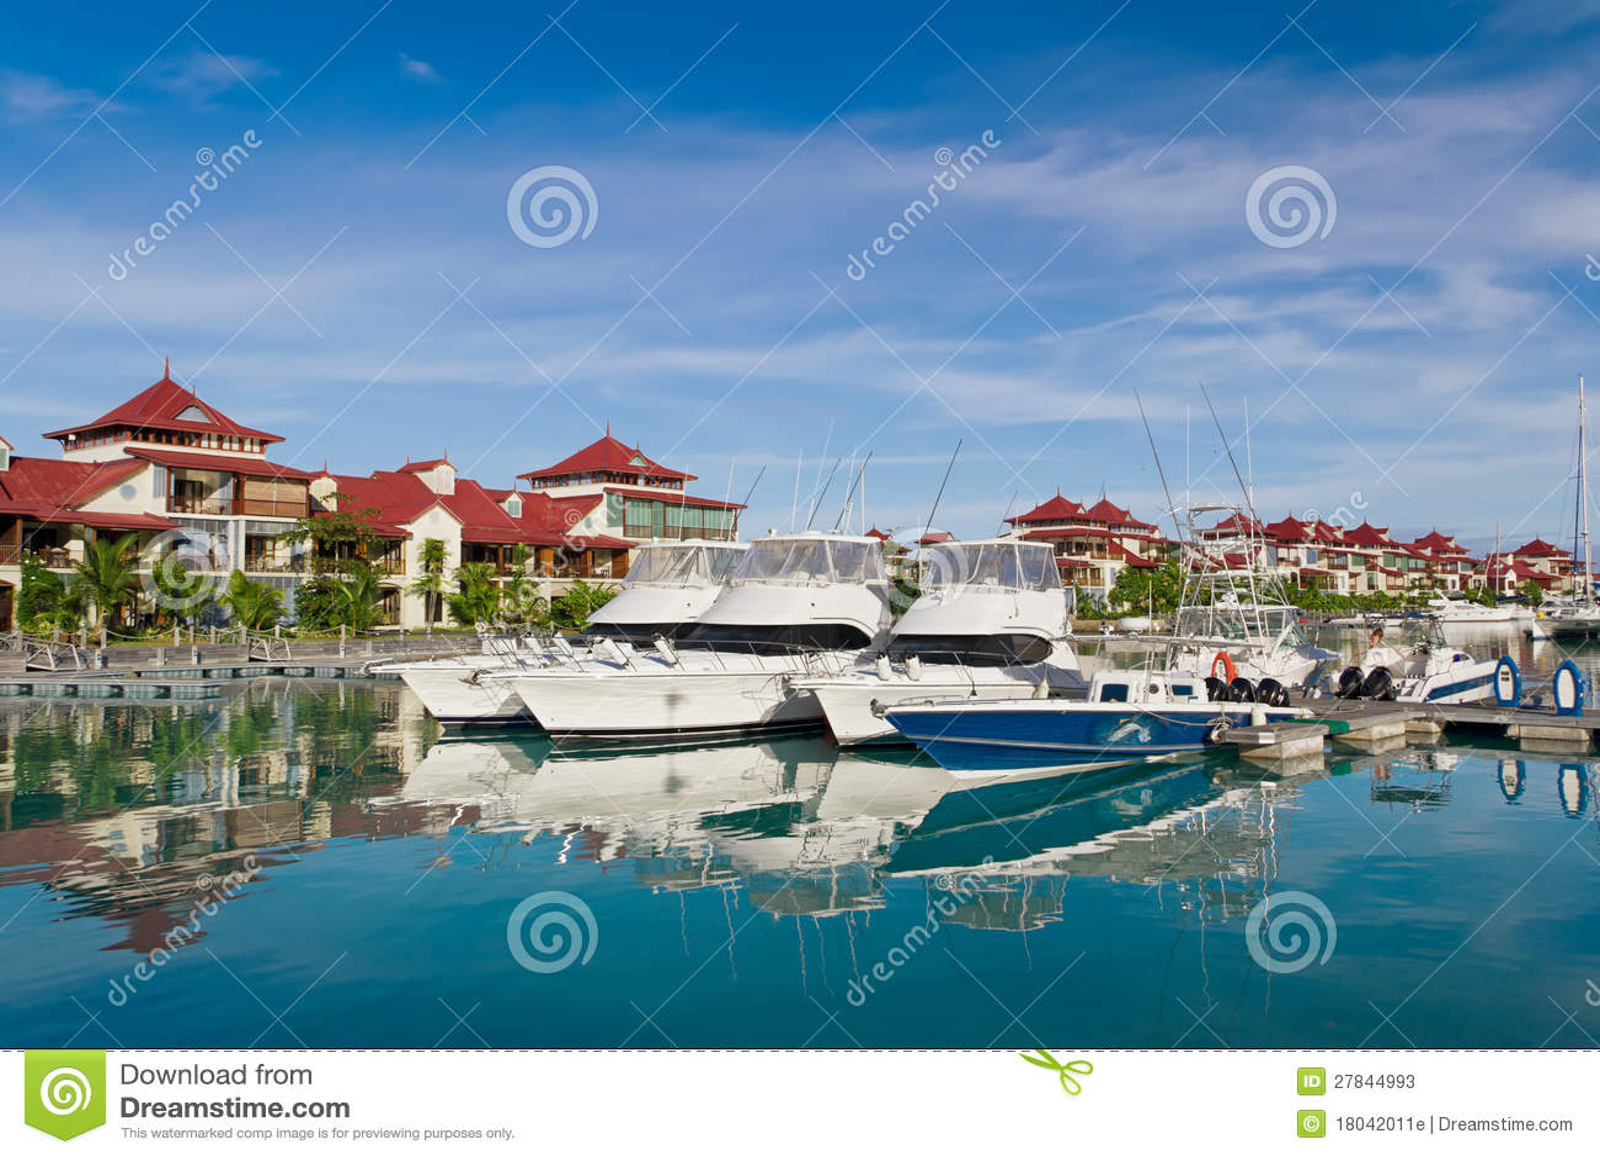 Eden island seychelles stock photos image 27844993 - Eden island hotel seychelles ...